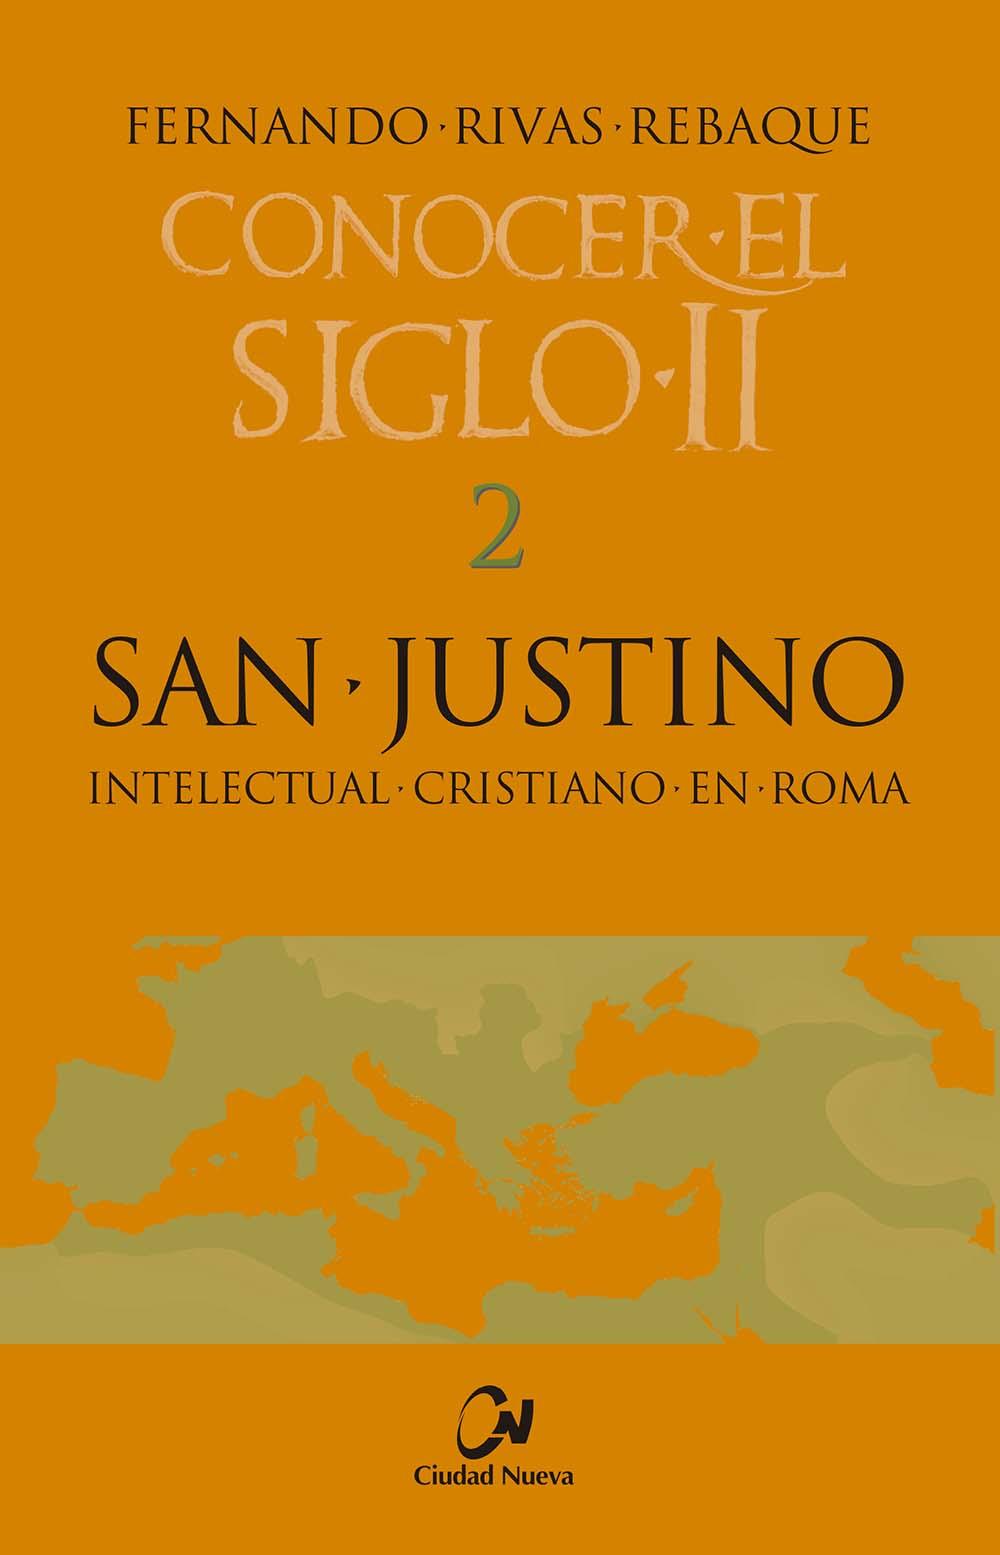 san-justino-intelectual-cristiano-en-roma